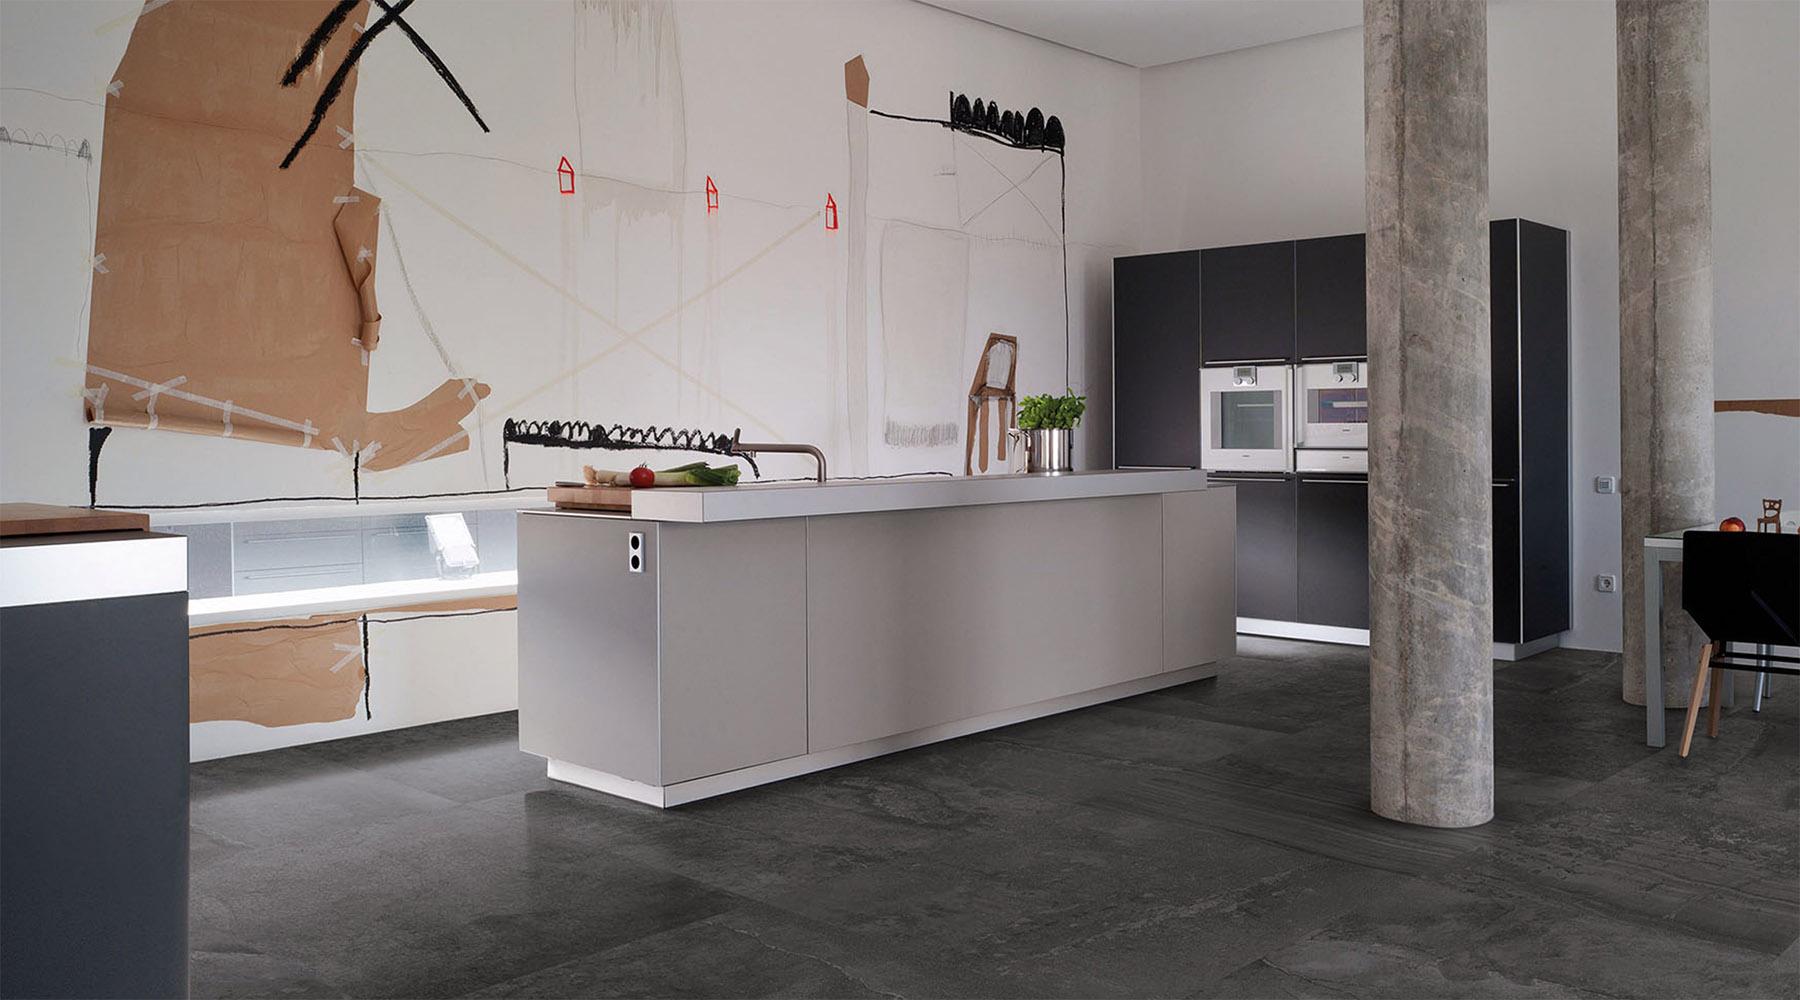 keramik f r k chen k chenabdeckung aus keramik. Black Bedroom Furniture Sets. Home Design Ideas